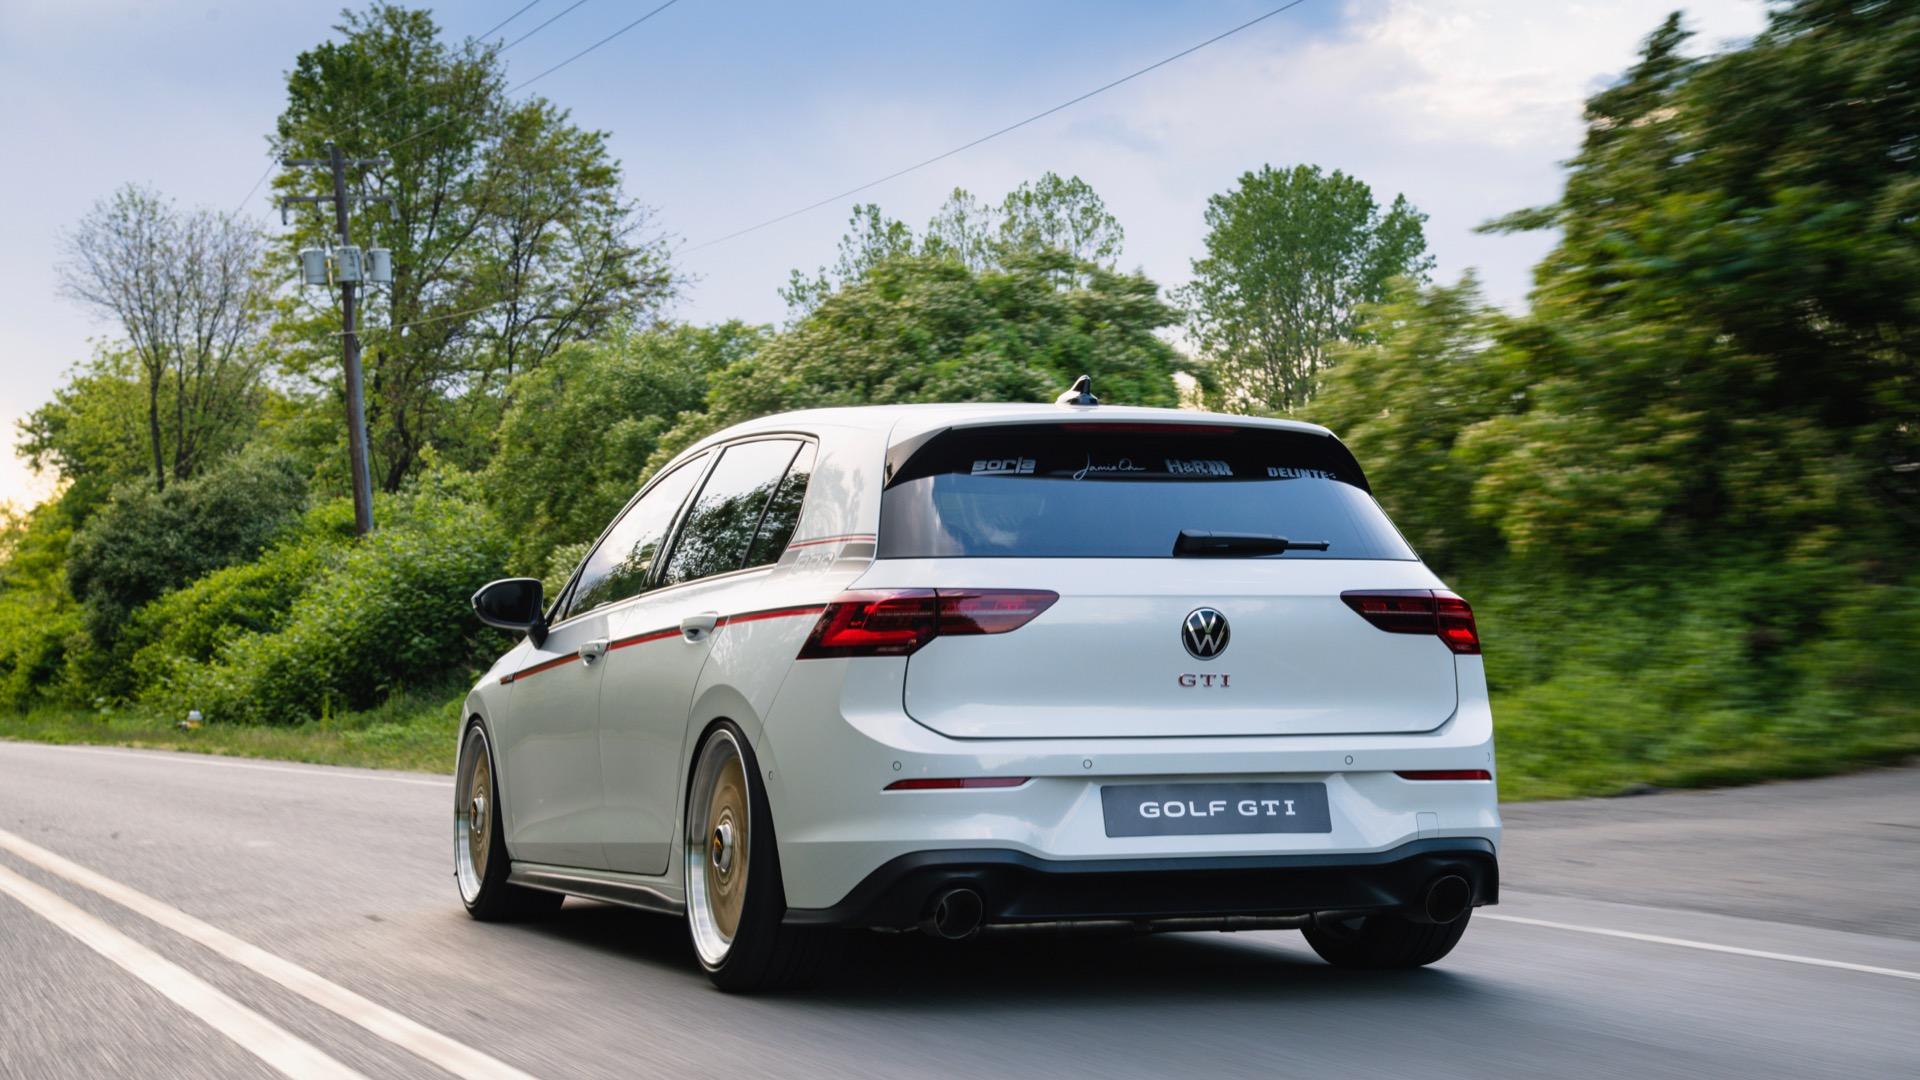 2021 Volkswagen GTI BBS concept Rear Three-Quarter Wallpapers (3)